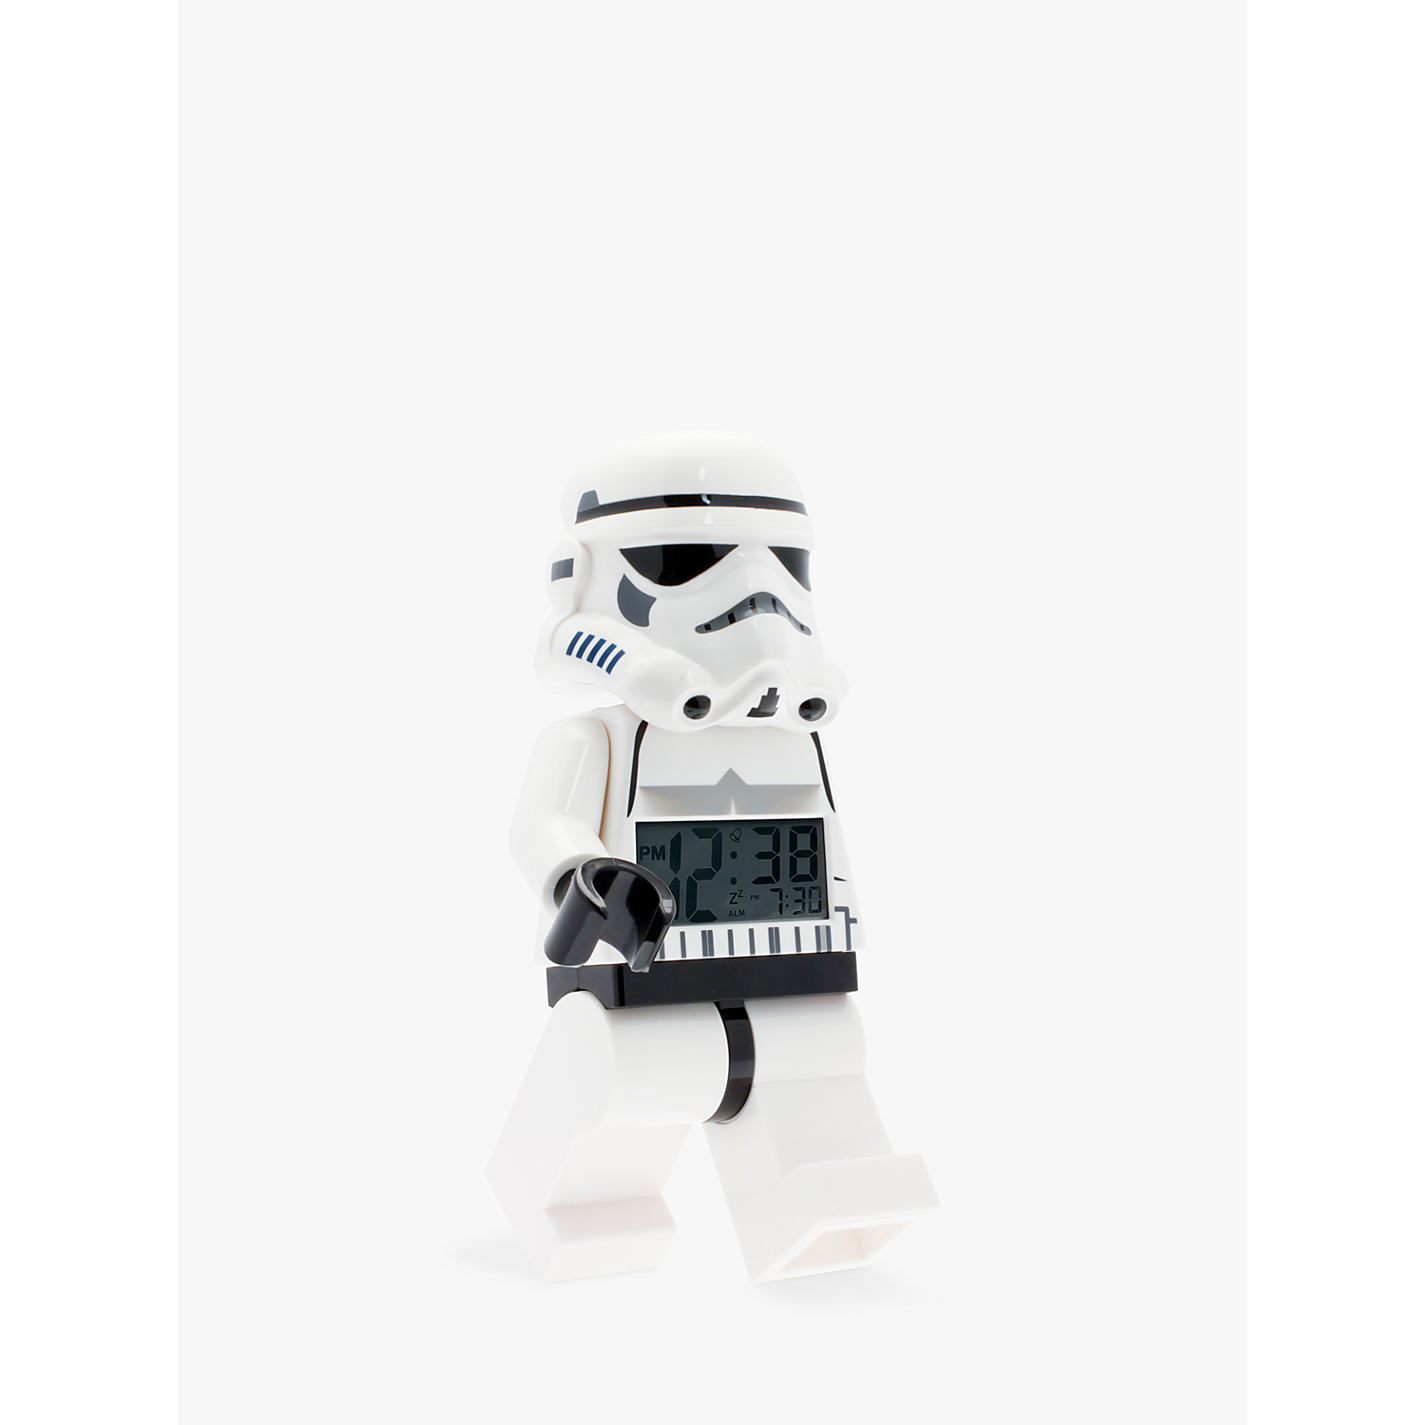 Buy Lego Star Wars Stormtrooper Alarm Clock John Lewis Girls Bedroom Clock festivales.us